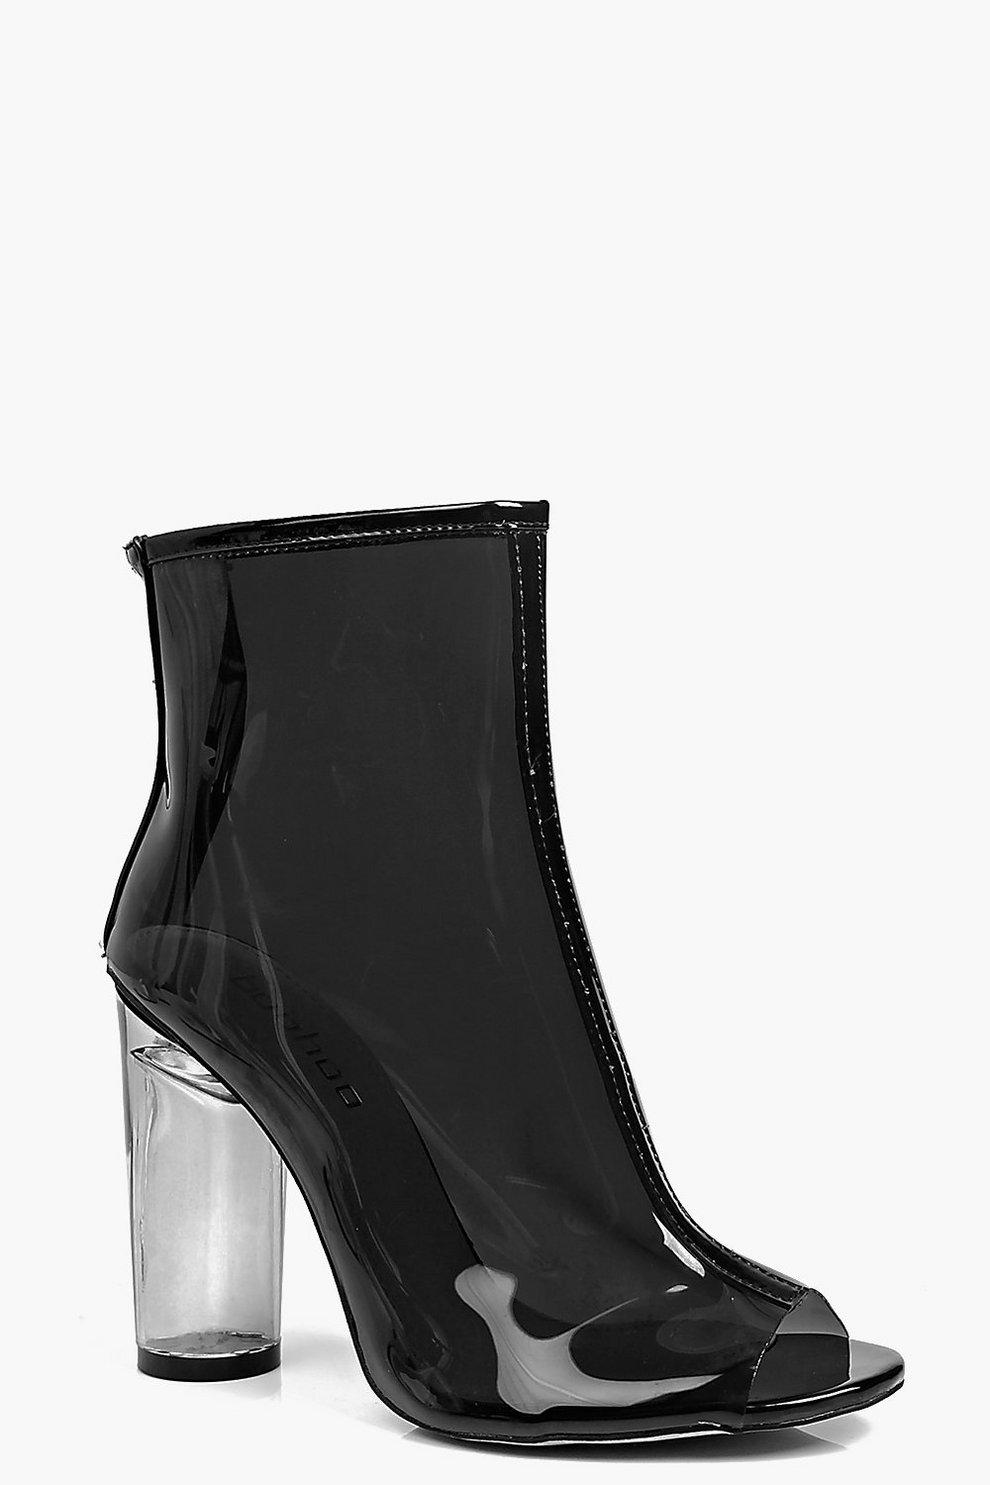 cb6c3153901 Peeptoe Clear Heel Shoe Boots